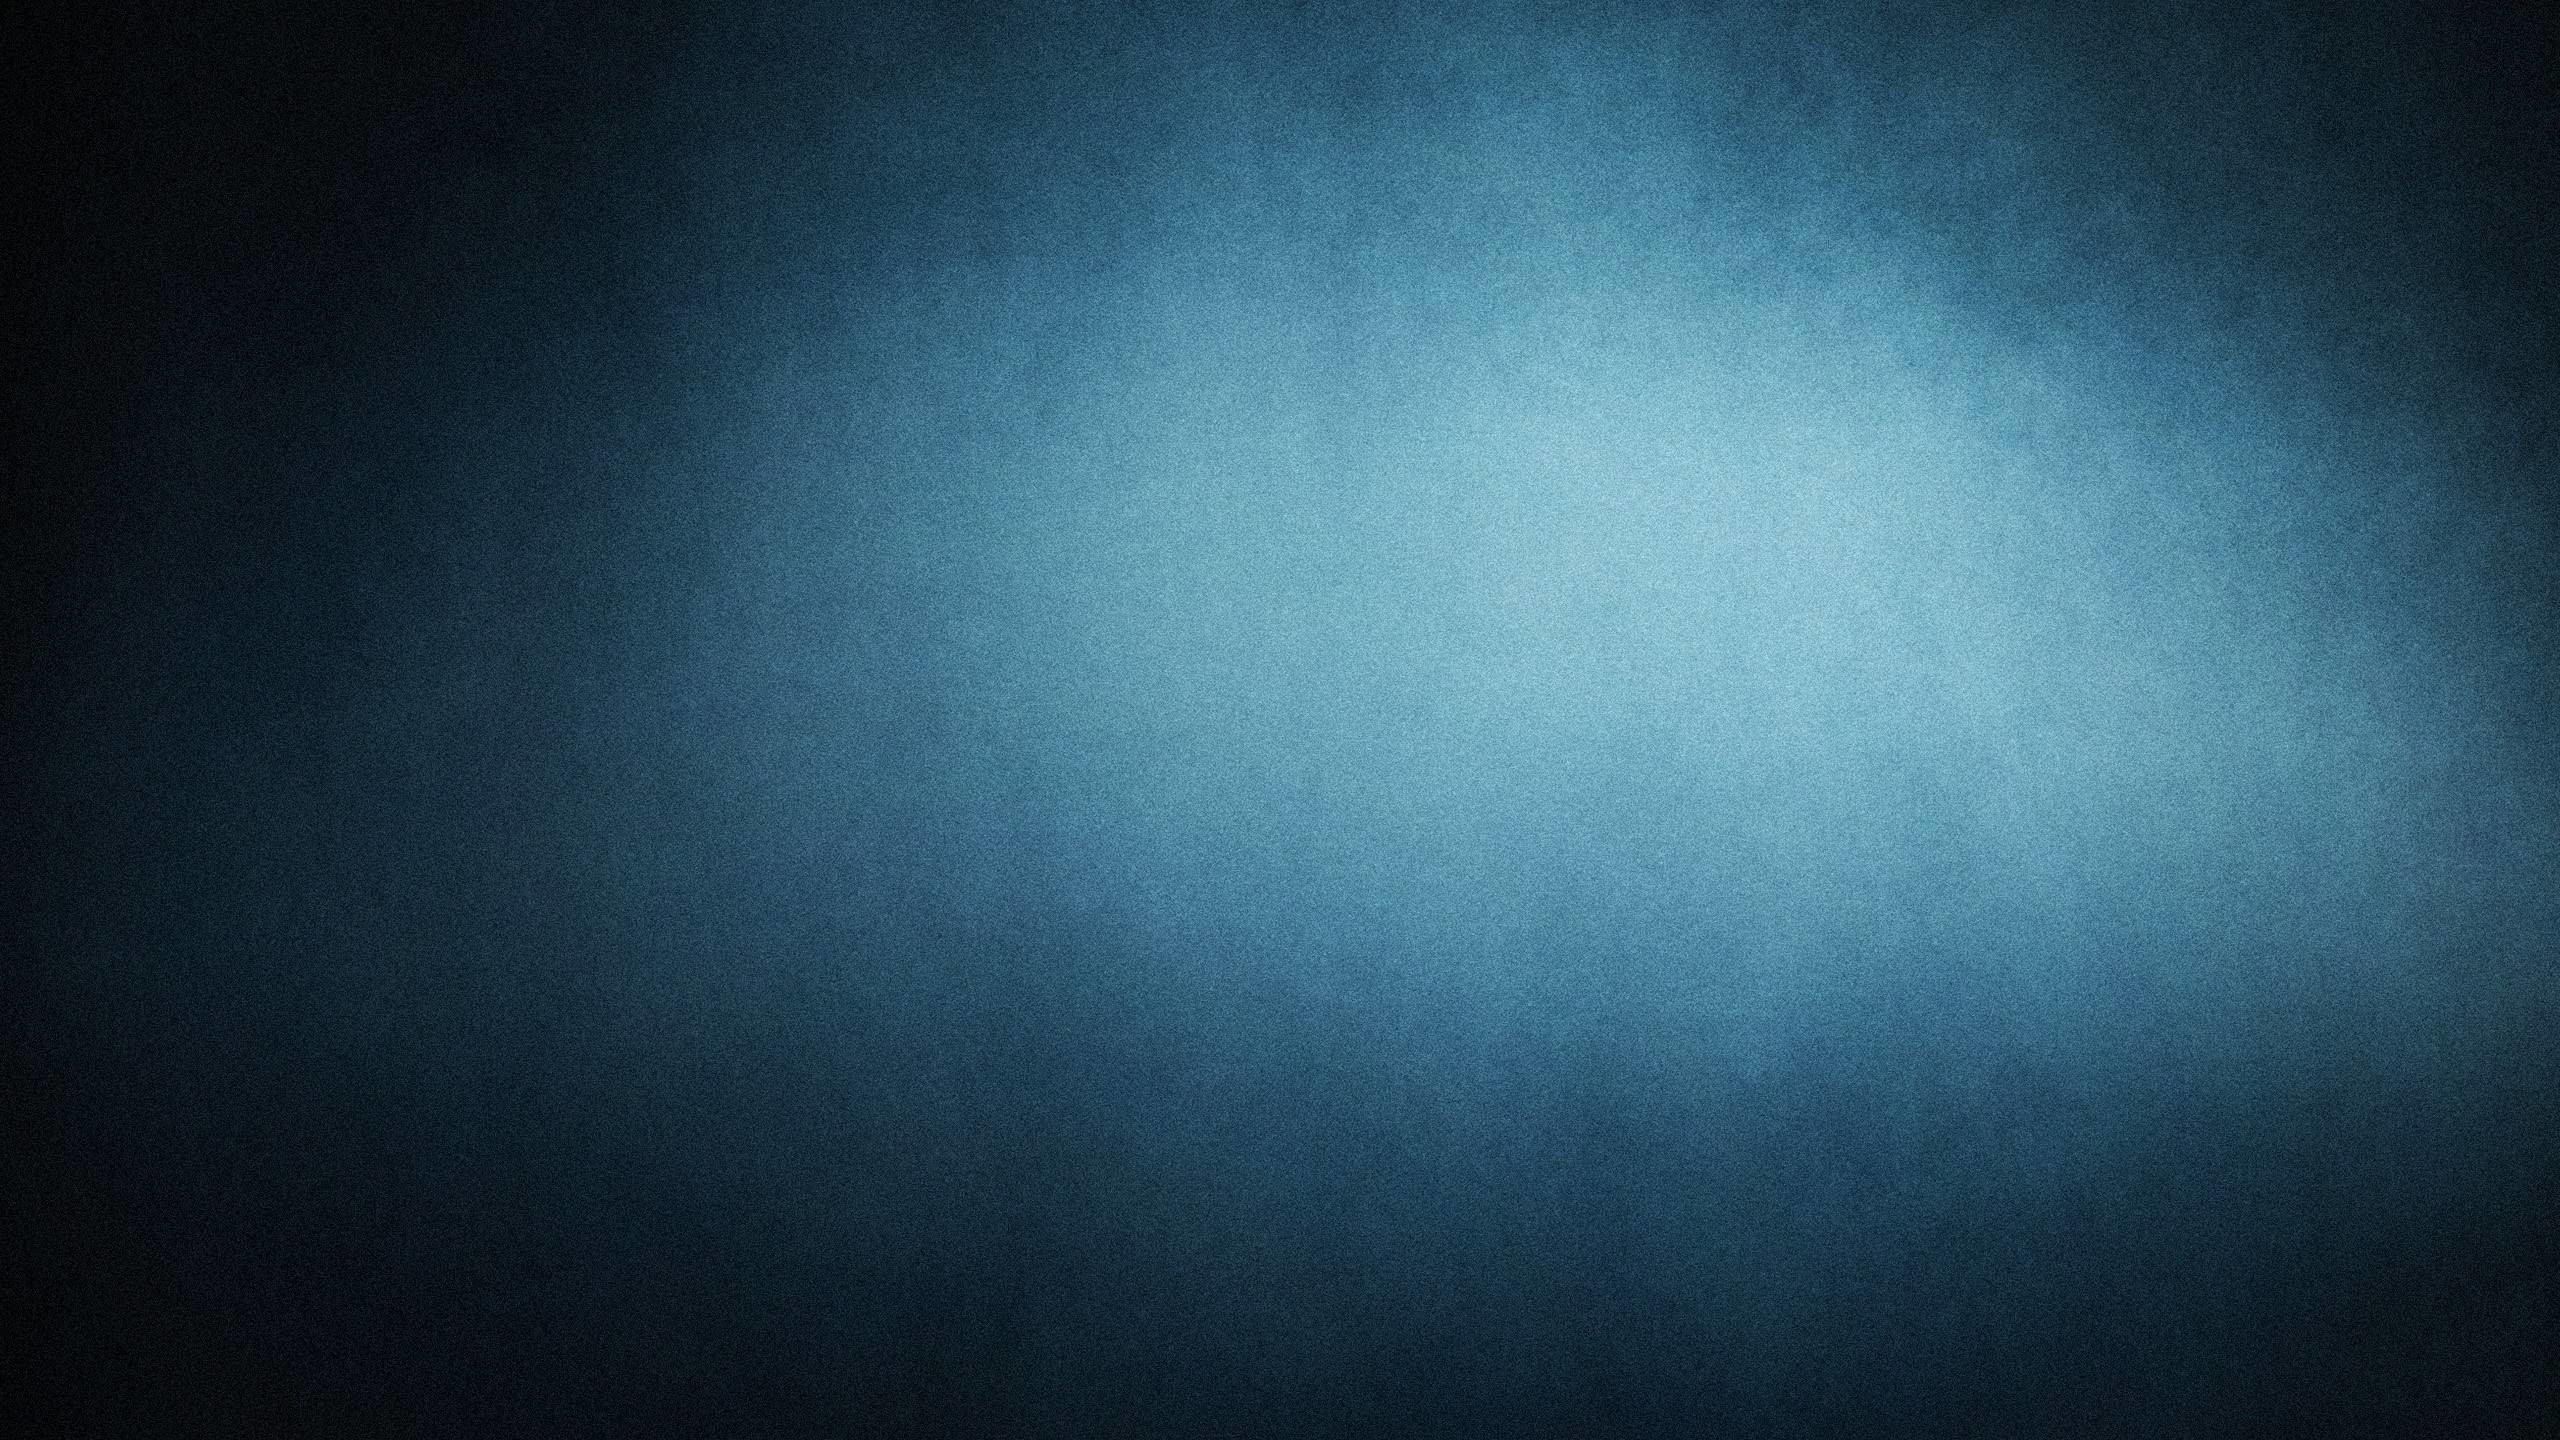 dark blue hd image